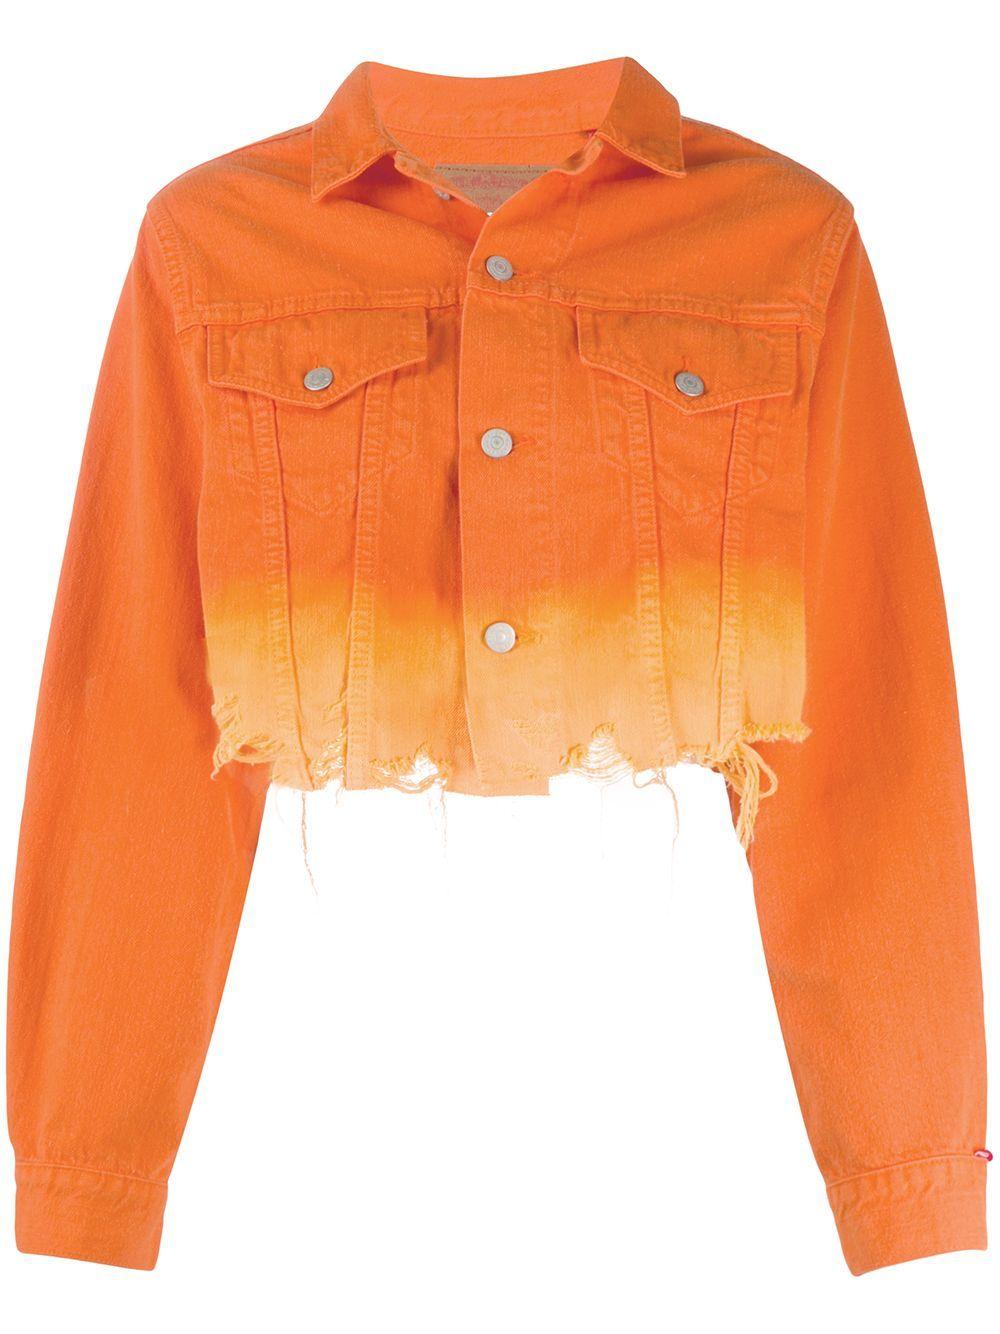 Denimist Gradient Effect Cropped Denim Jacket Farfetch Denim Jacket Jackets Cropped Denim Jacket [ 1334 x 1000 Pixel ]